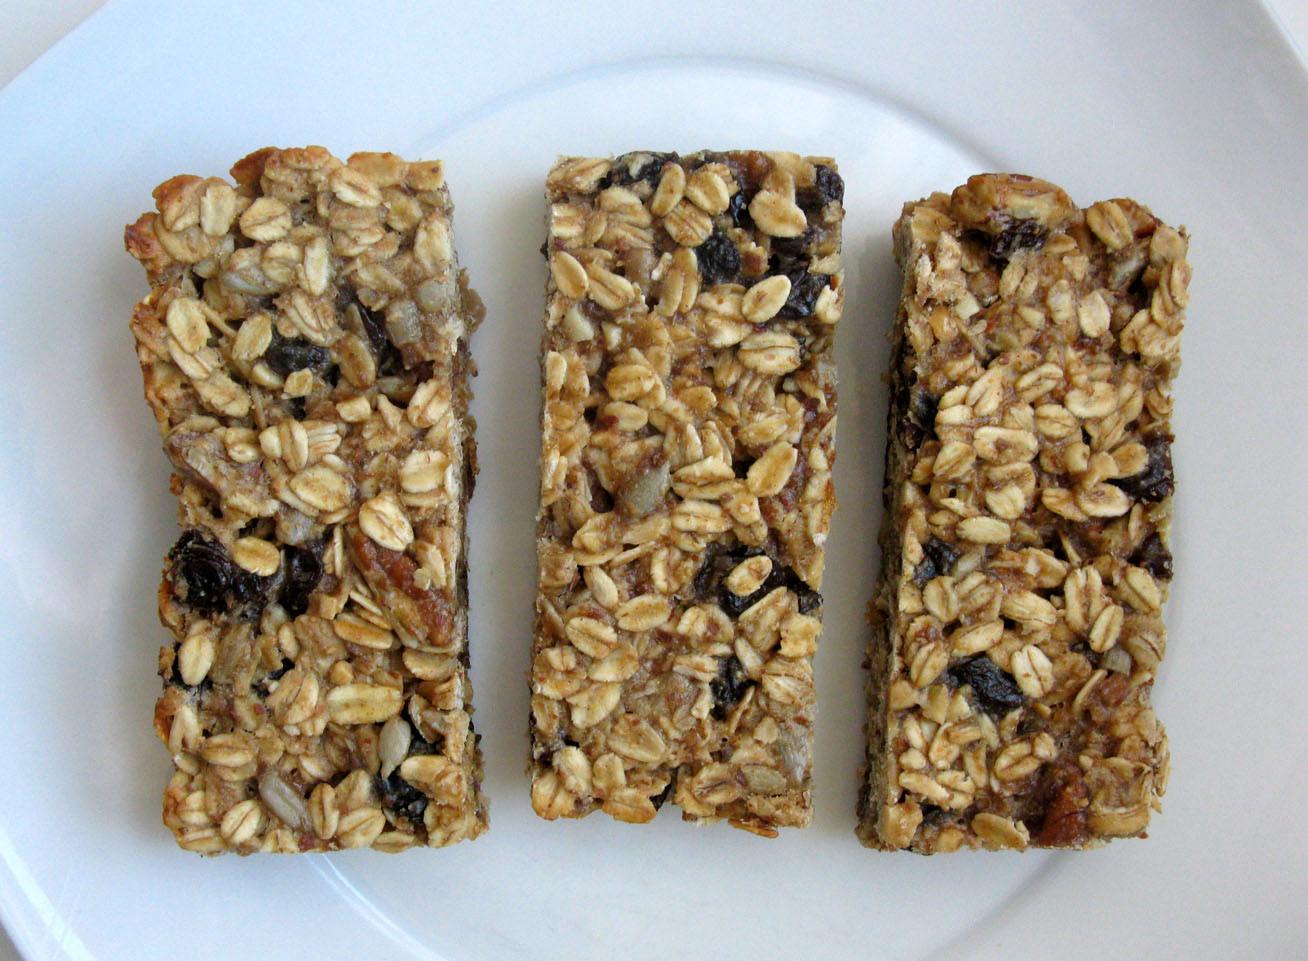 Healthy Nut Free Snacks  10 Super Healthy Sugar Free Vegan Snacks